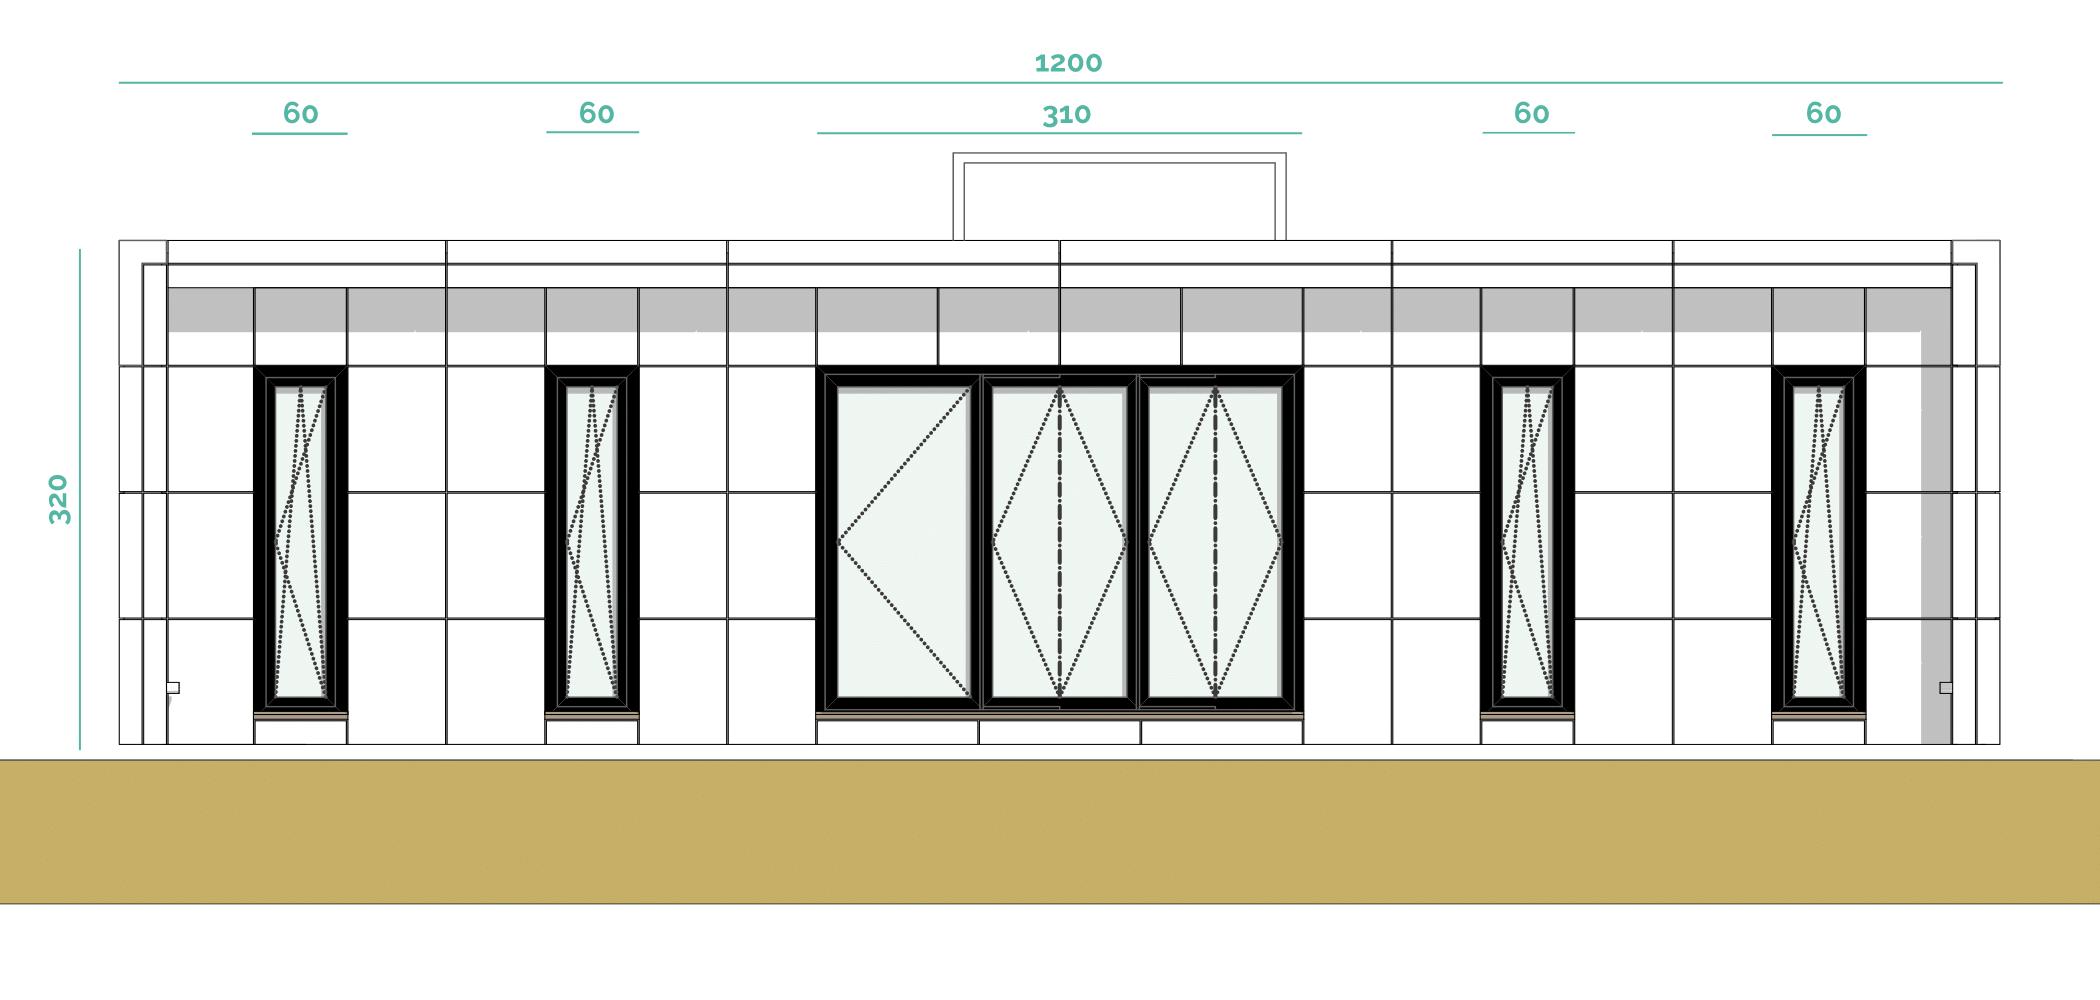 Tiny House BLOXS Frontansicht mit 12 Metern Länge